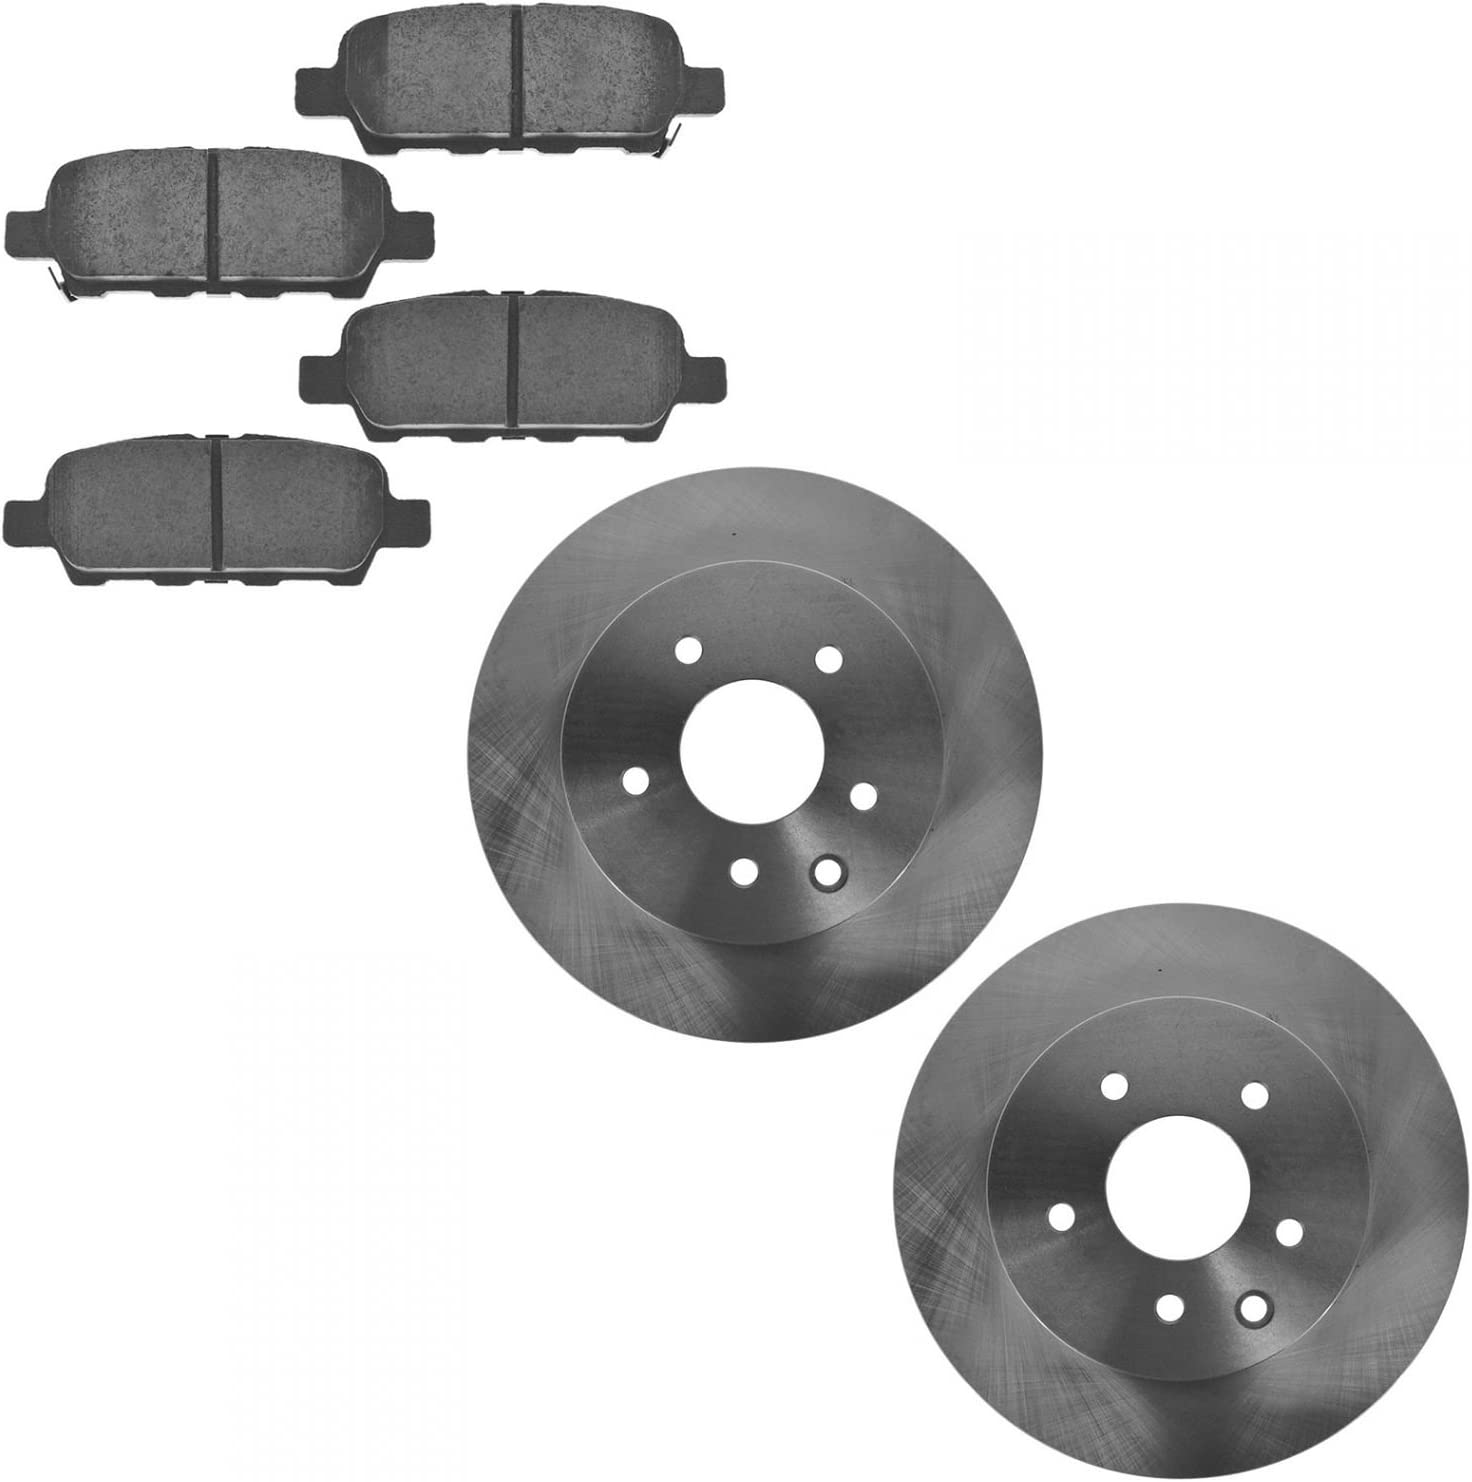 Brake Pad Rotor Kit Rear Posi Ceramic Ranking TOP10 Premium With Compatible Washington Mall